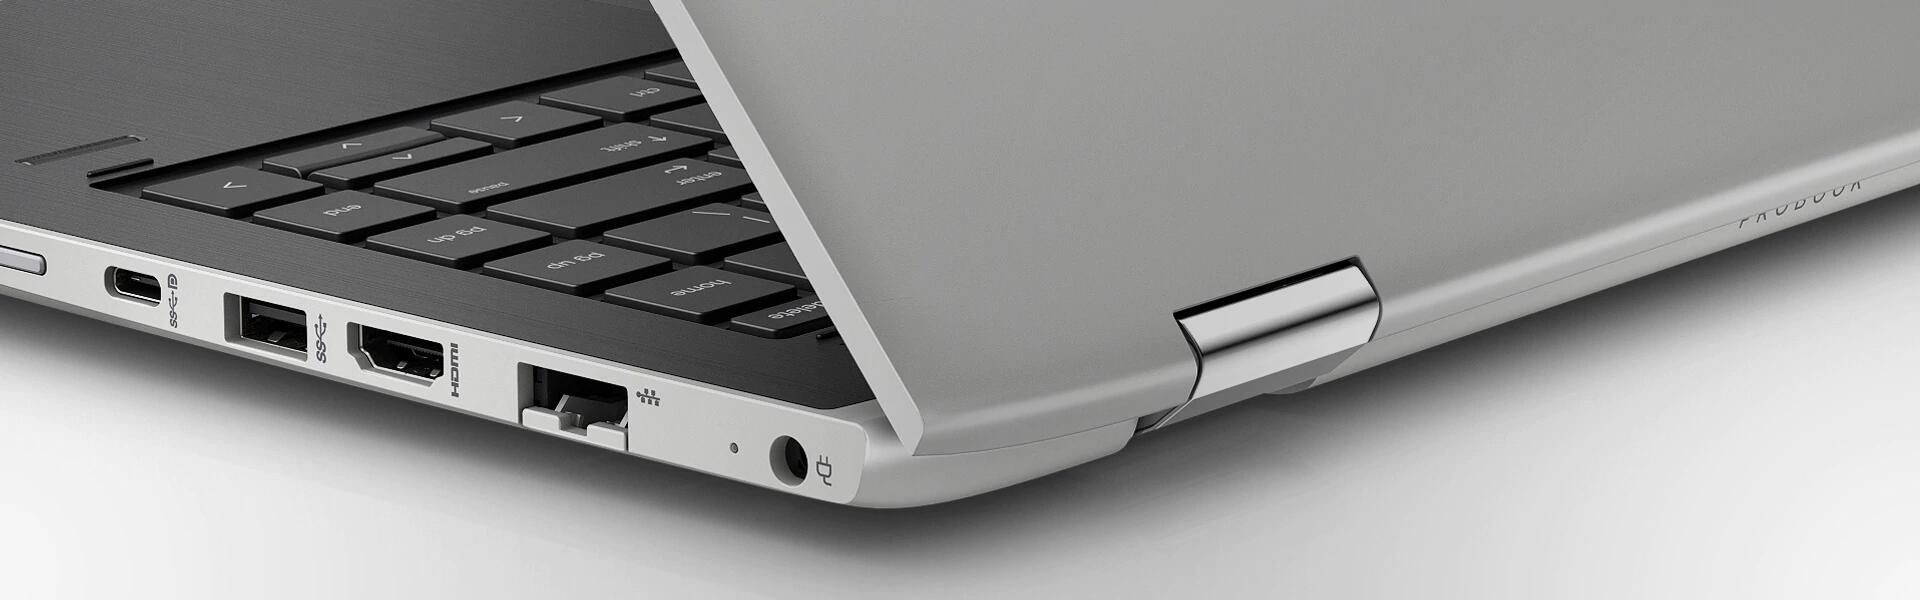 laptops empresariais ProBook 400